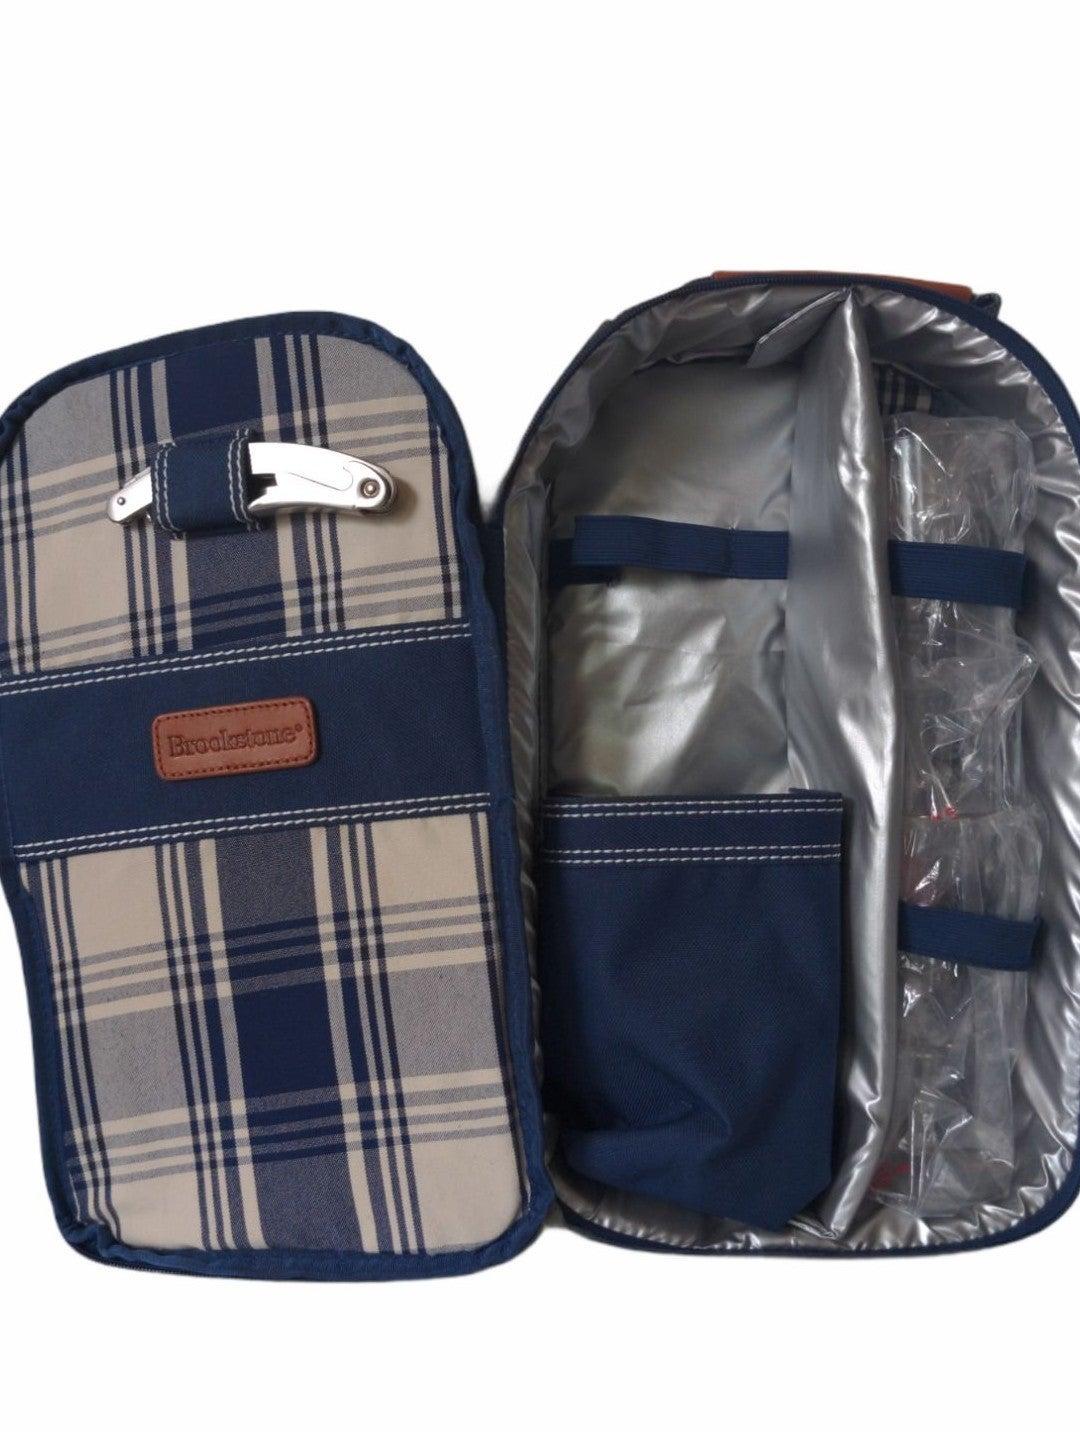 Brookstone wine carrier- bag